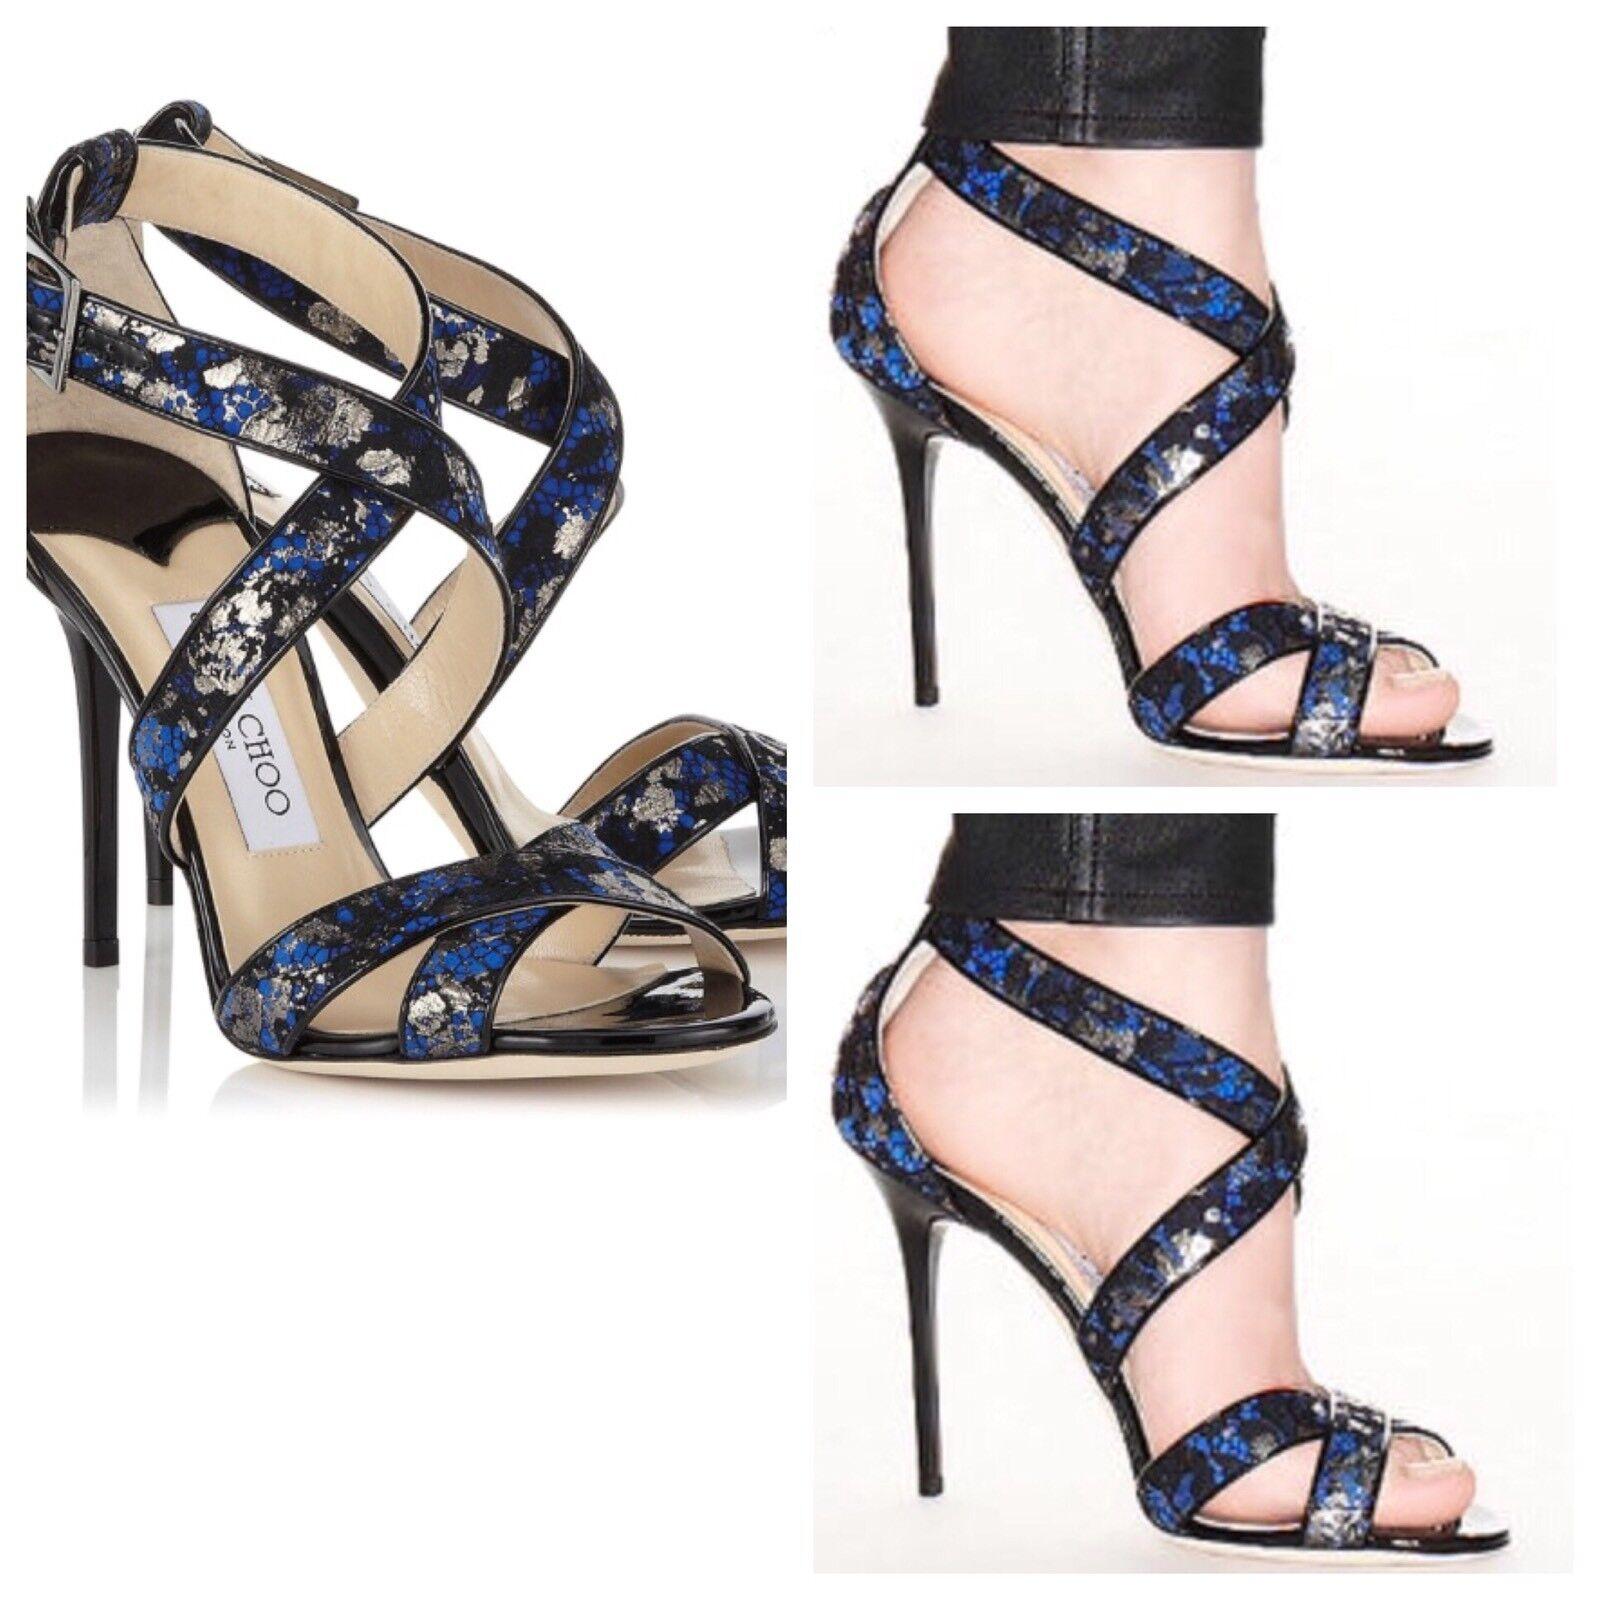 online economico Jimmy Choo Lottie Aegean Metallic Metallic Metallic Lace Sandals Dimensione 6.5US MSRP  850  l'ultimo